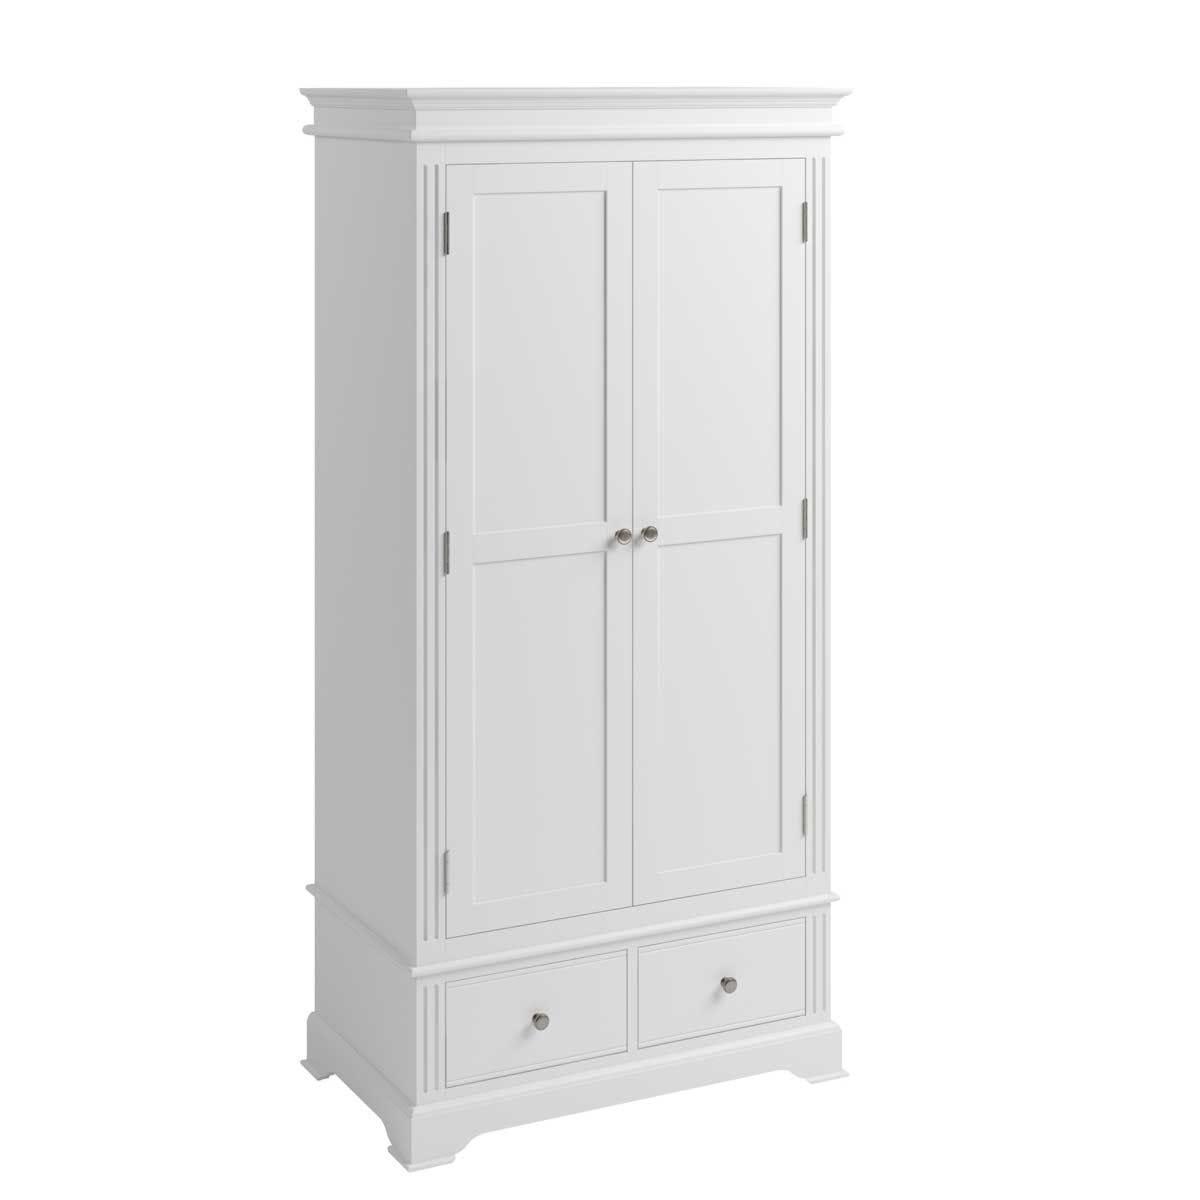 Bingley Double Wardrobe - White